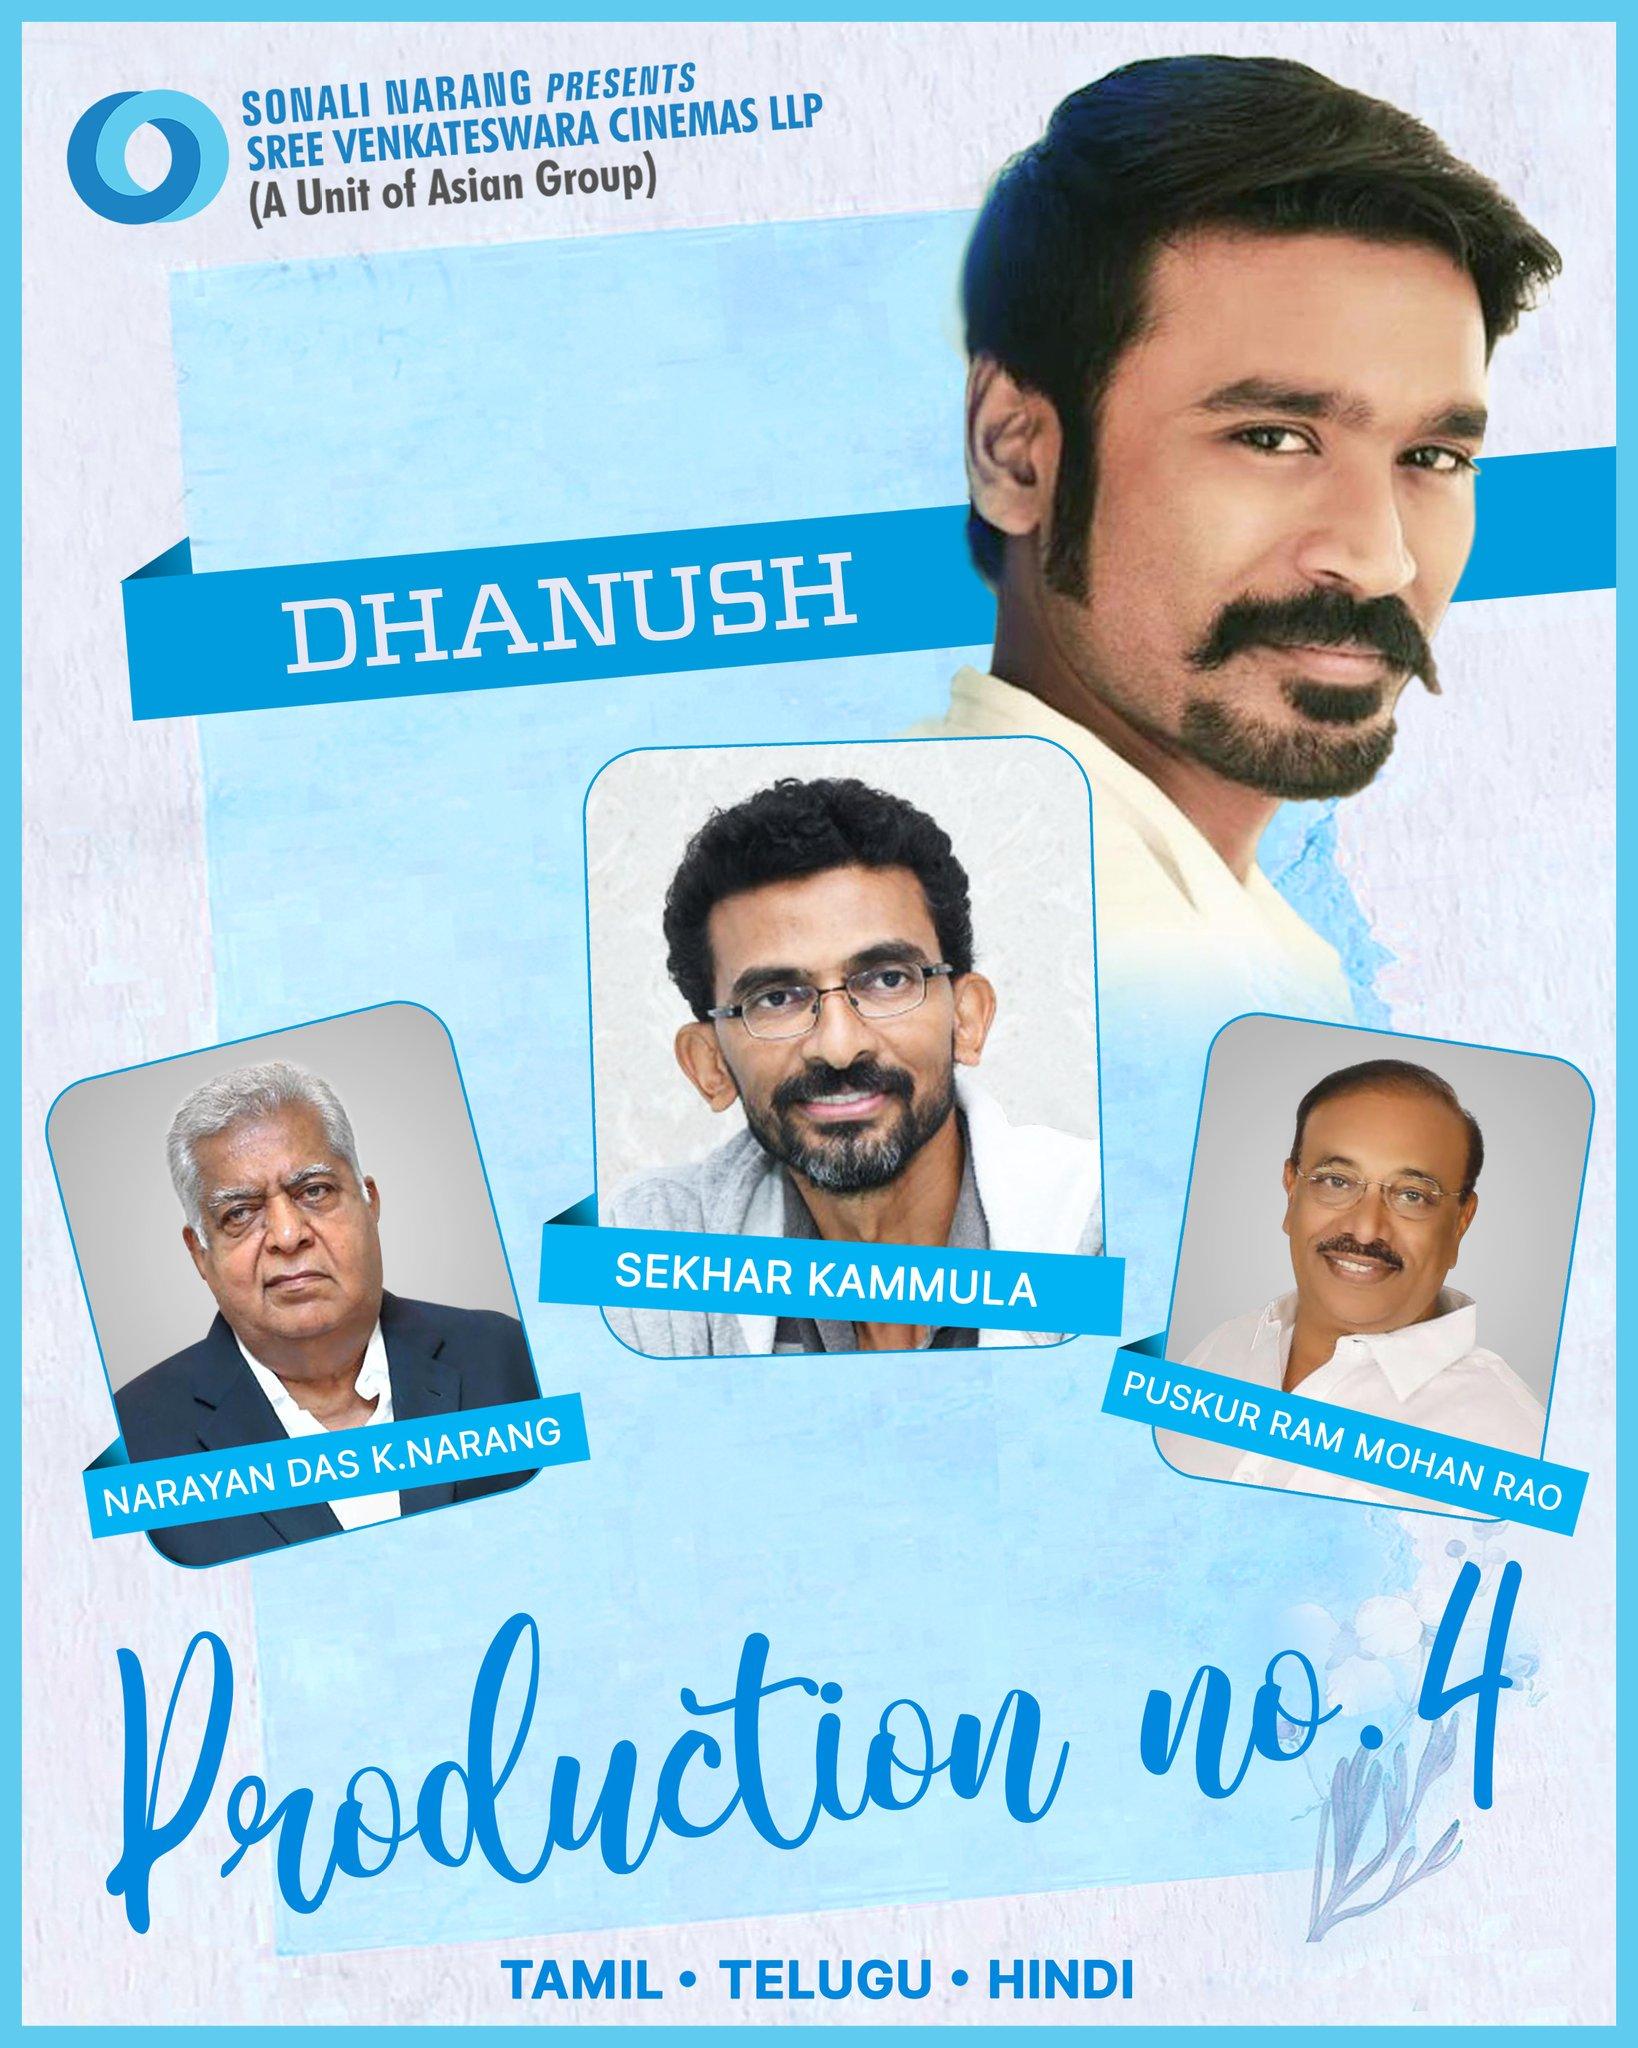 Superstar Dhanush, Sensible Director Sekhar Kammula, Narayan Das K Narang & Puskur Ram Mohan Rao's Sree Venkateswara Cinemas LLP's Trilingual Film Announced